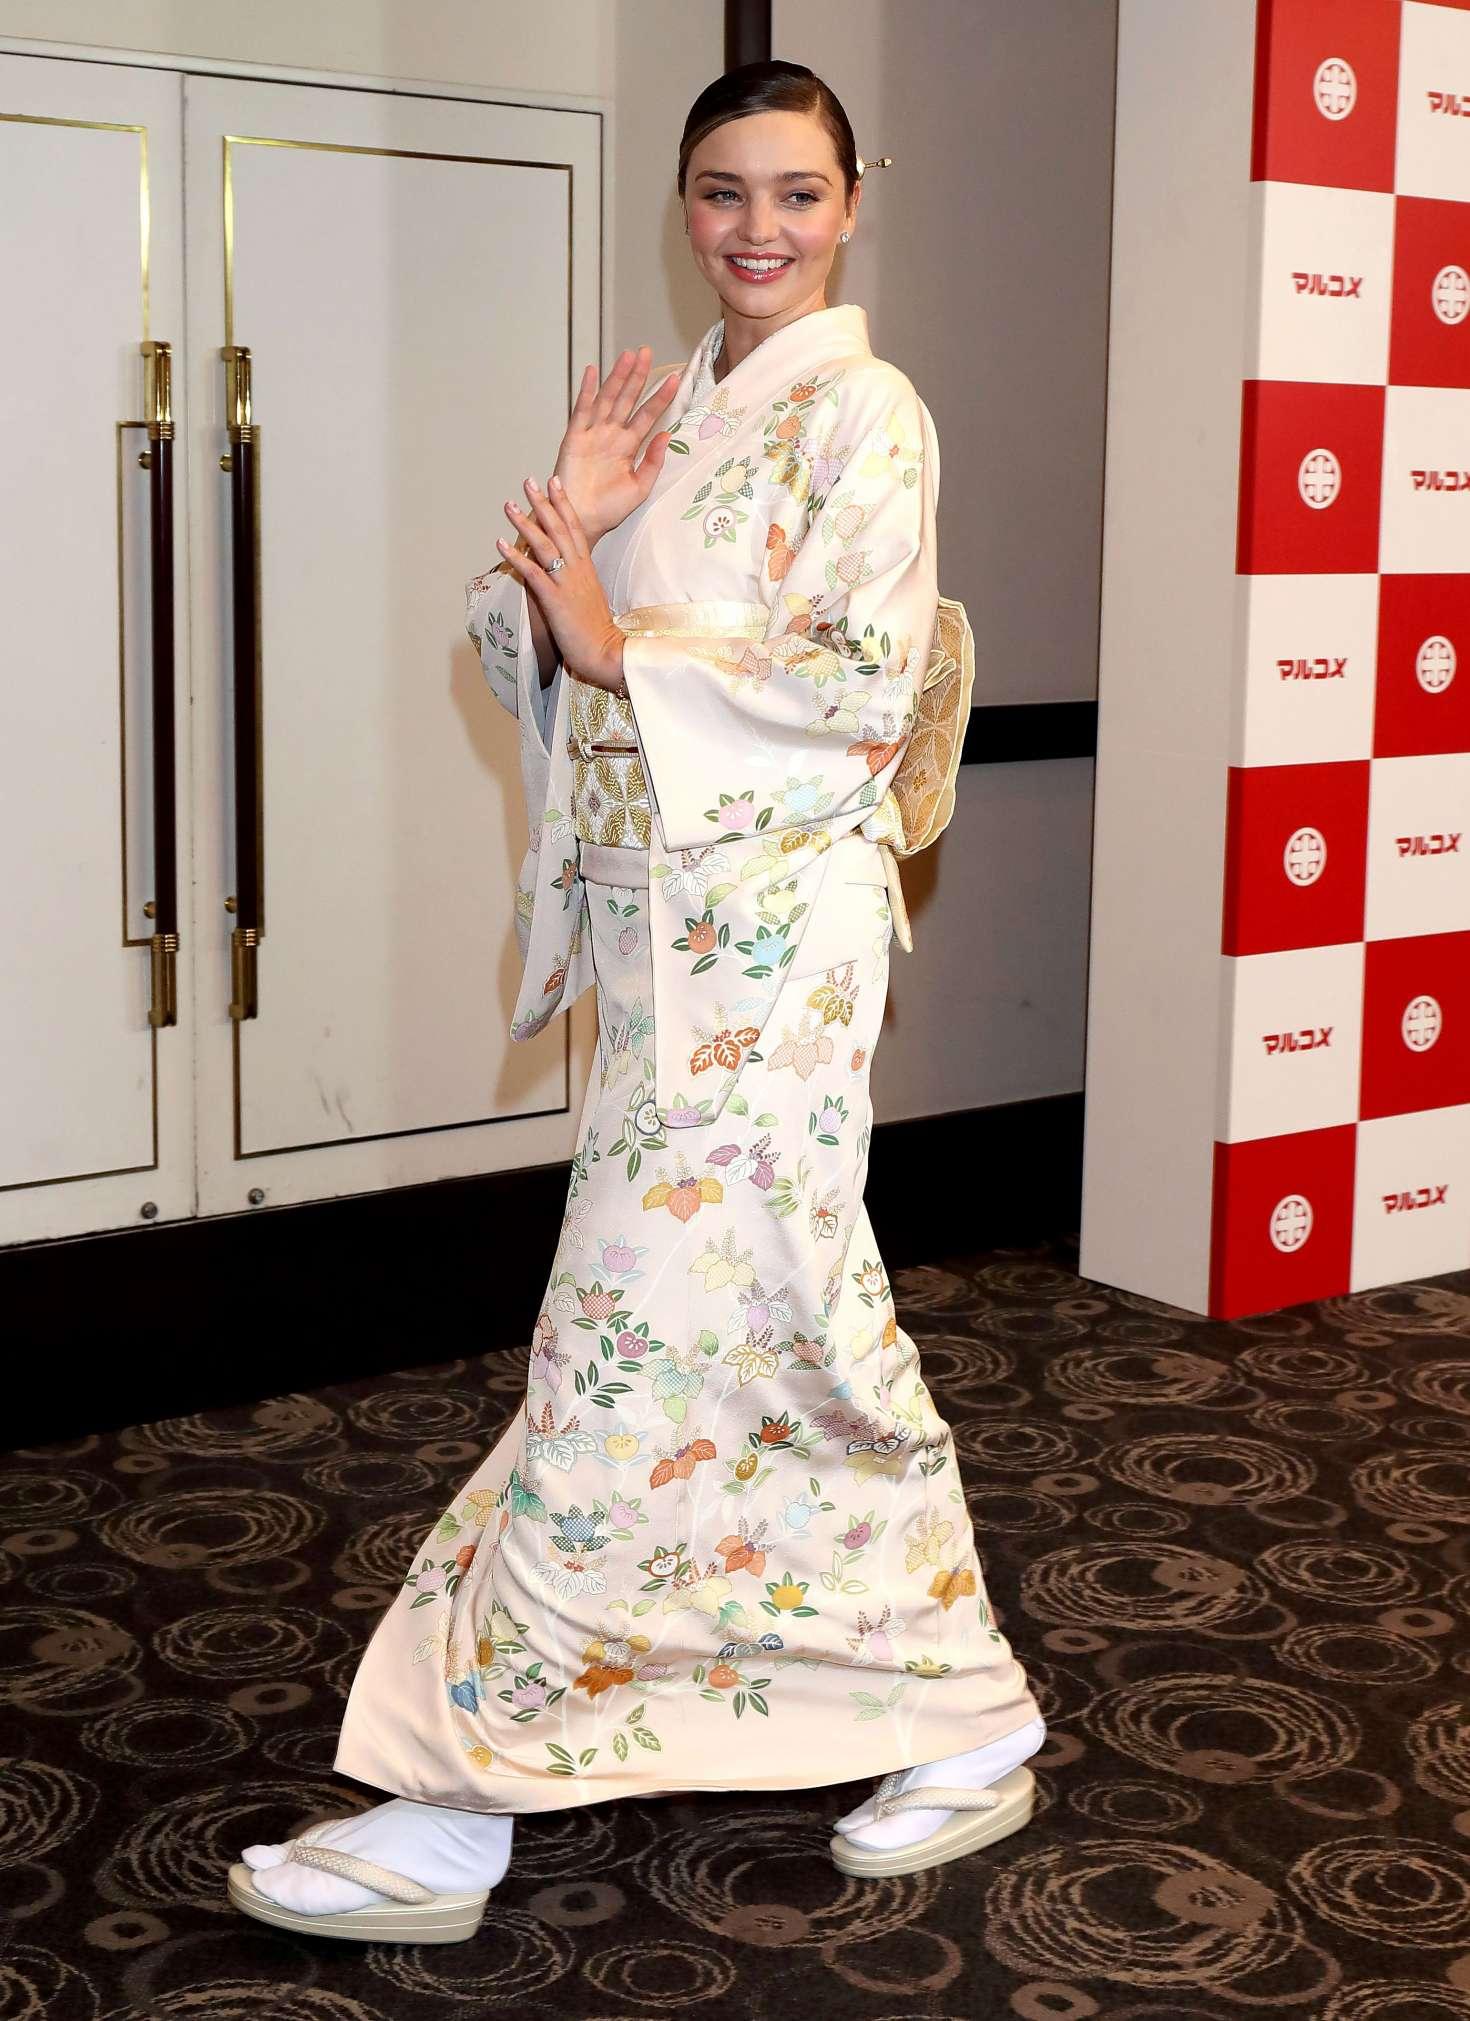 Miranda Kerr - Promotes 'Marukome Co. Ltd' Miso Products in Tokyo